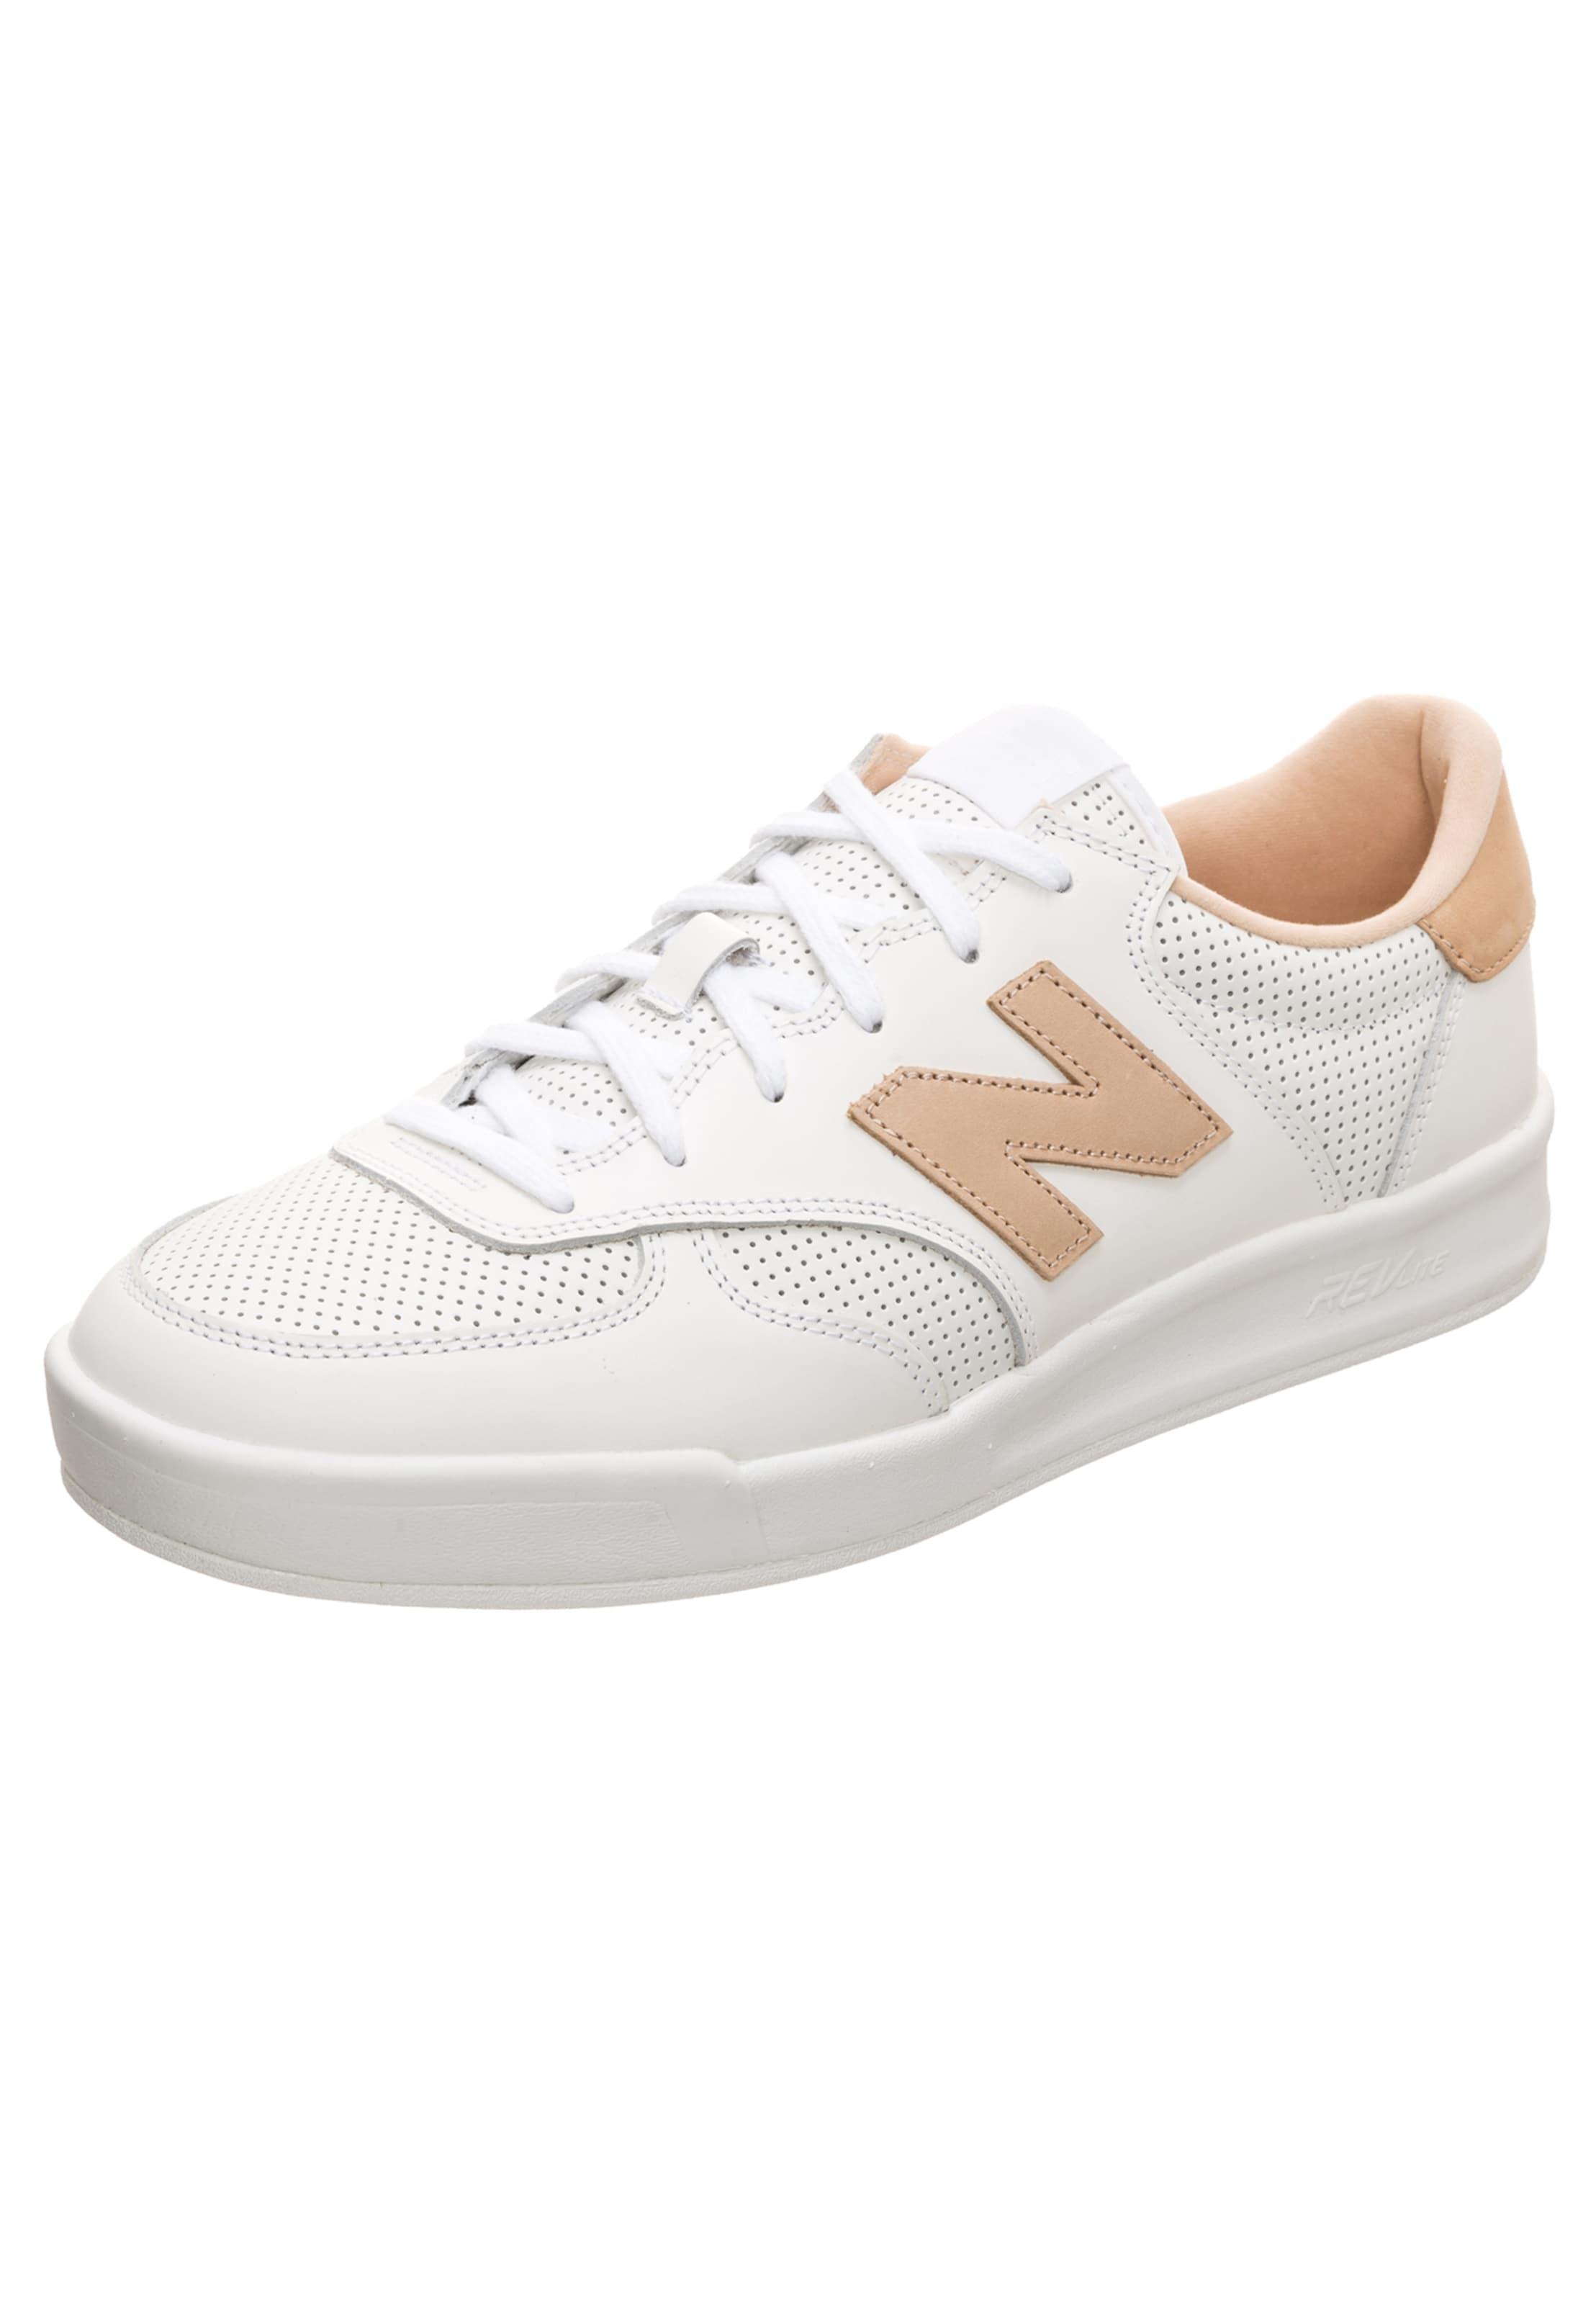 new balance CRT300-AJ-D Sneaker Günstige und langlebige Schuhe